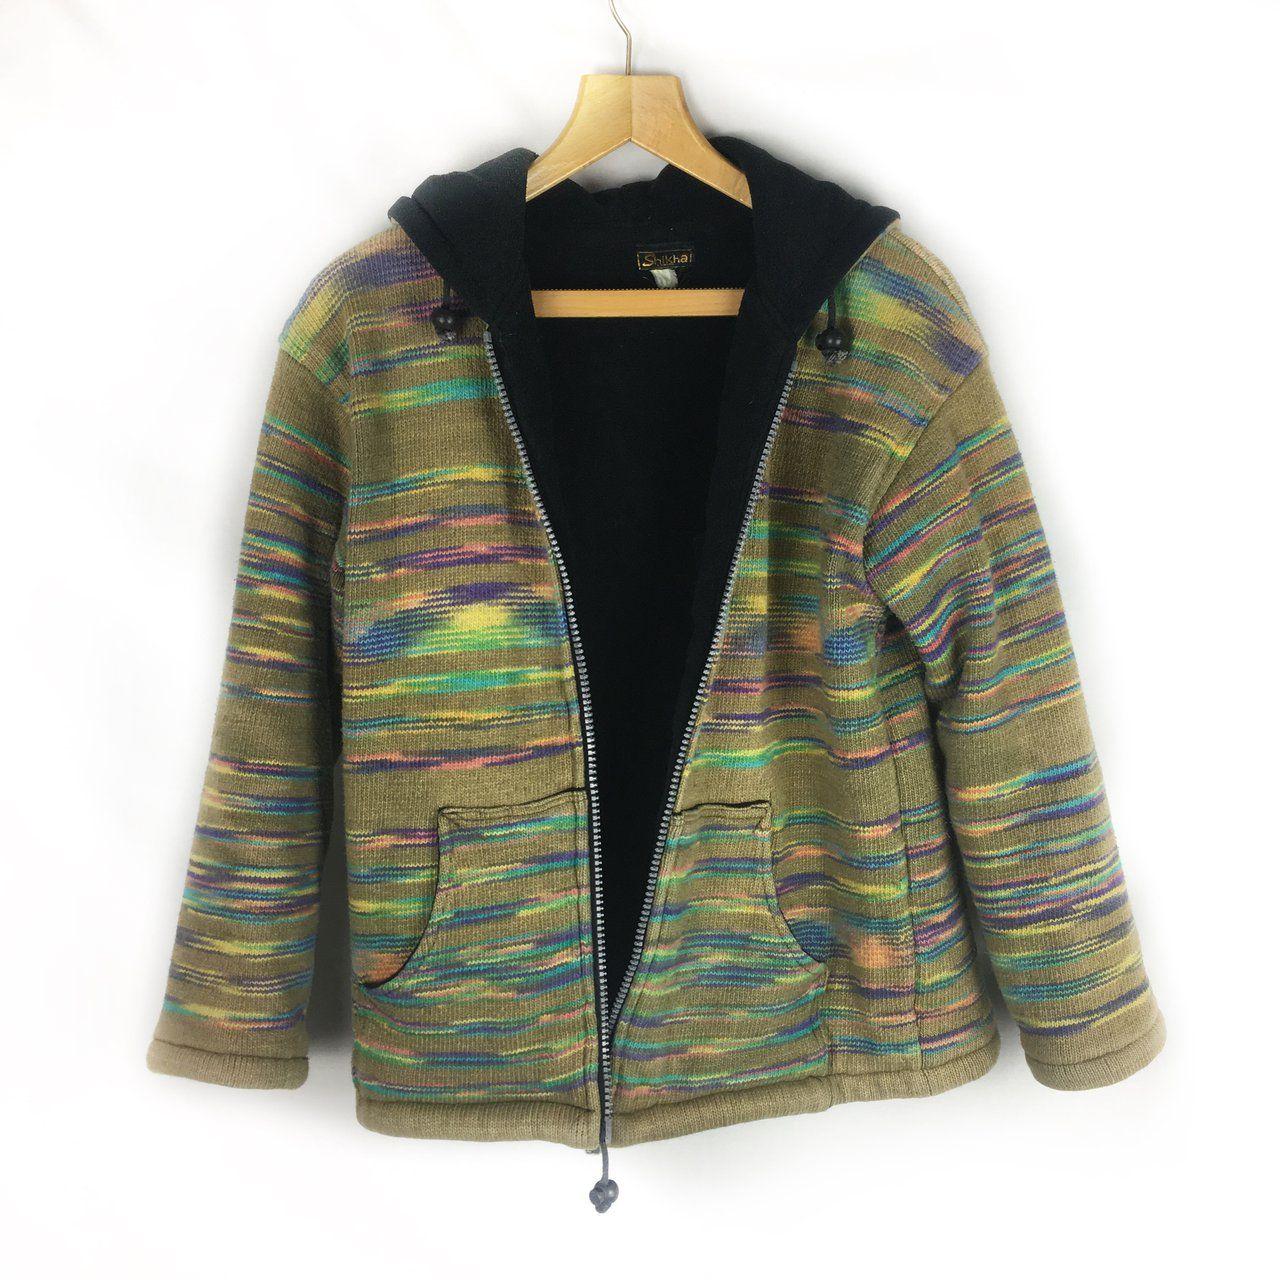 Such a beautiful hooded woven rainbow fleece u handmade thick